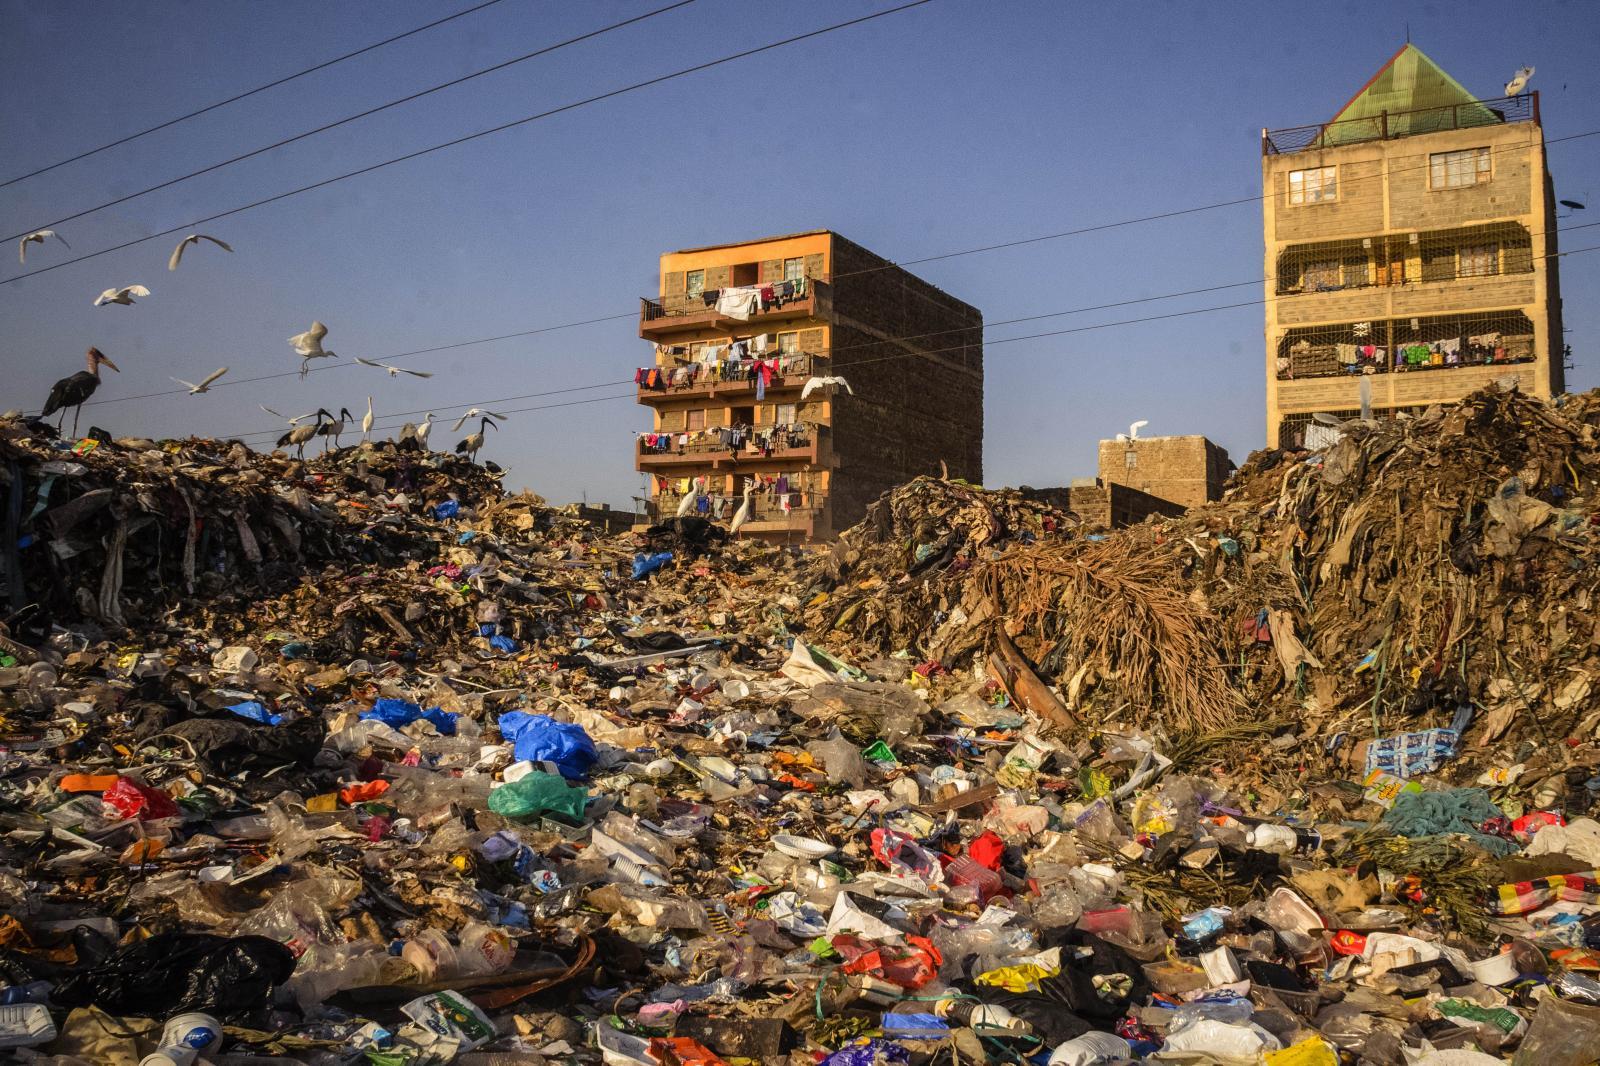 Birds scavenge the waste at Dandora Landfill, Nairobi Kenya's landfill on September 19, 2019.